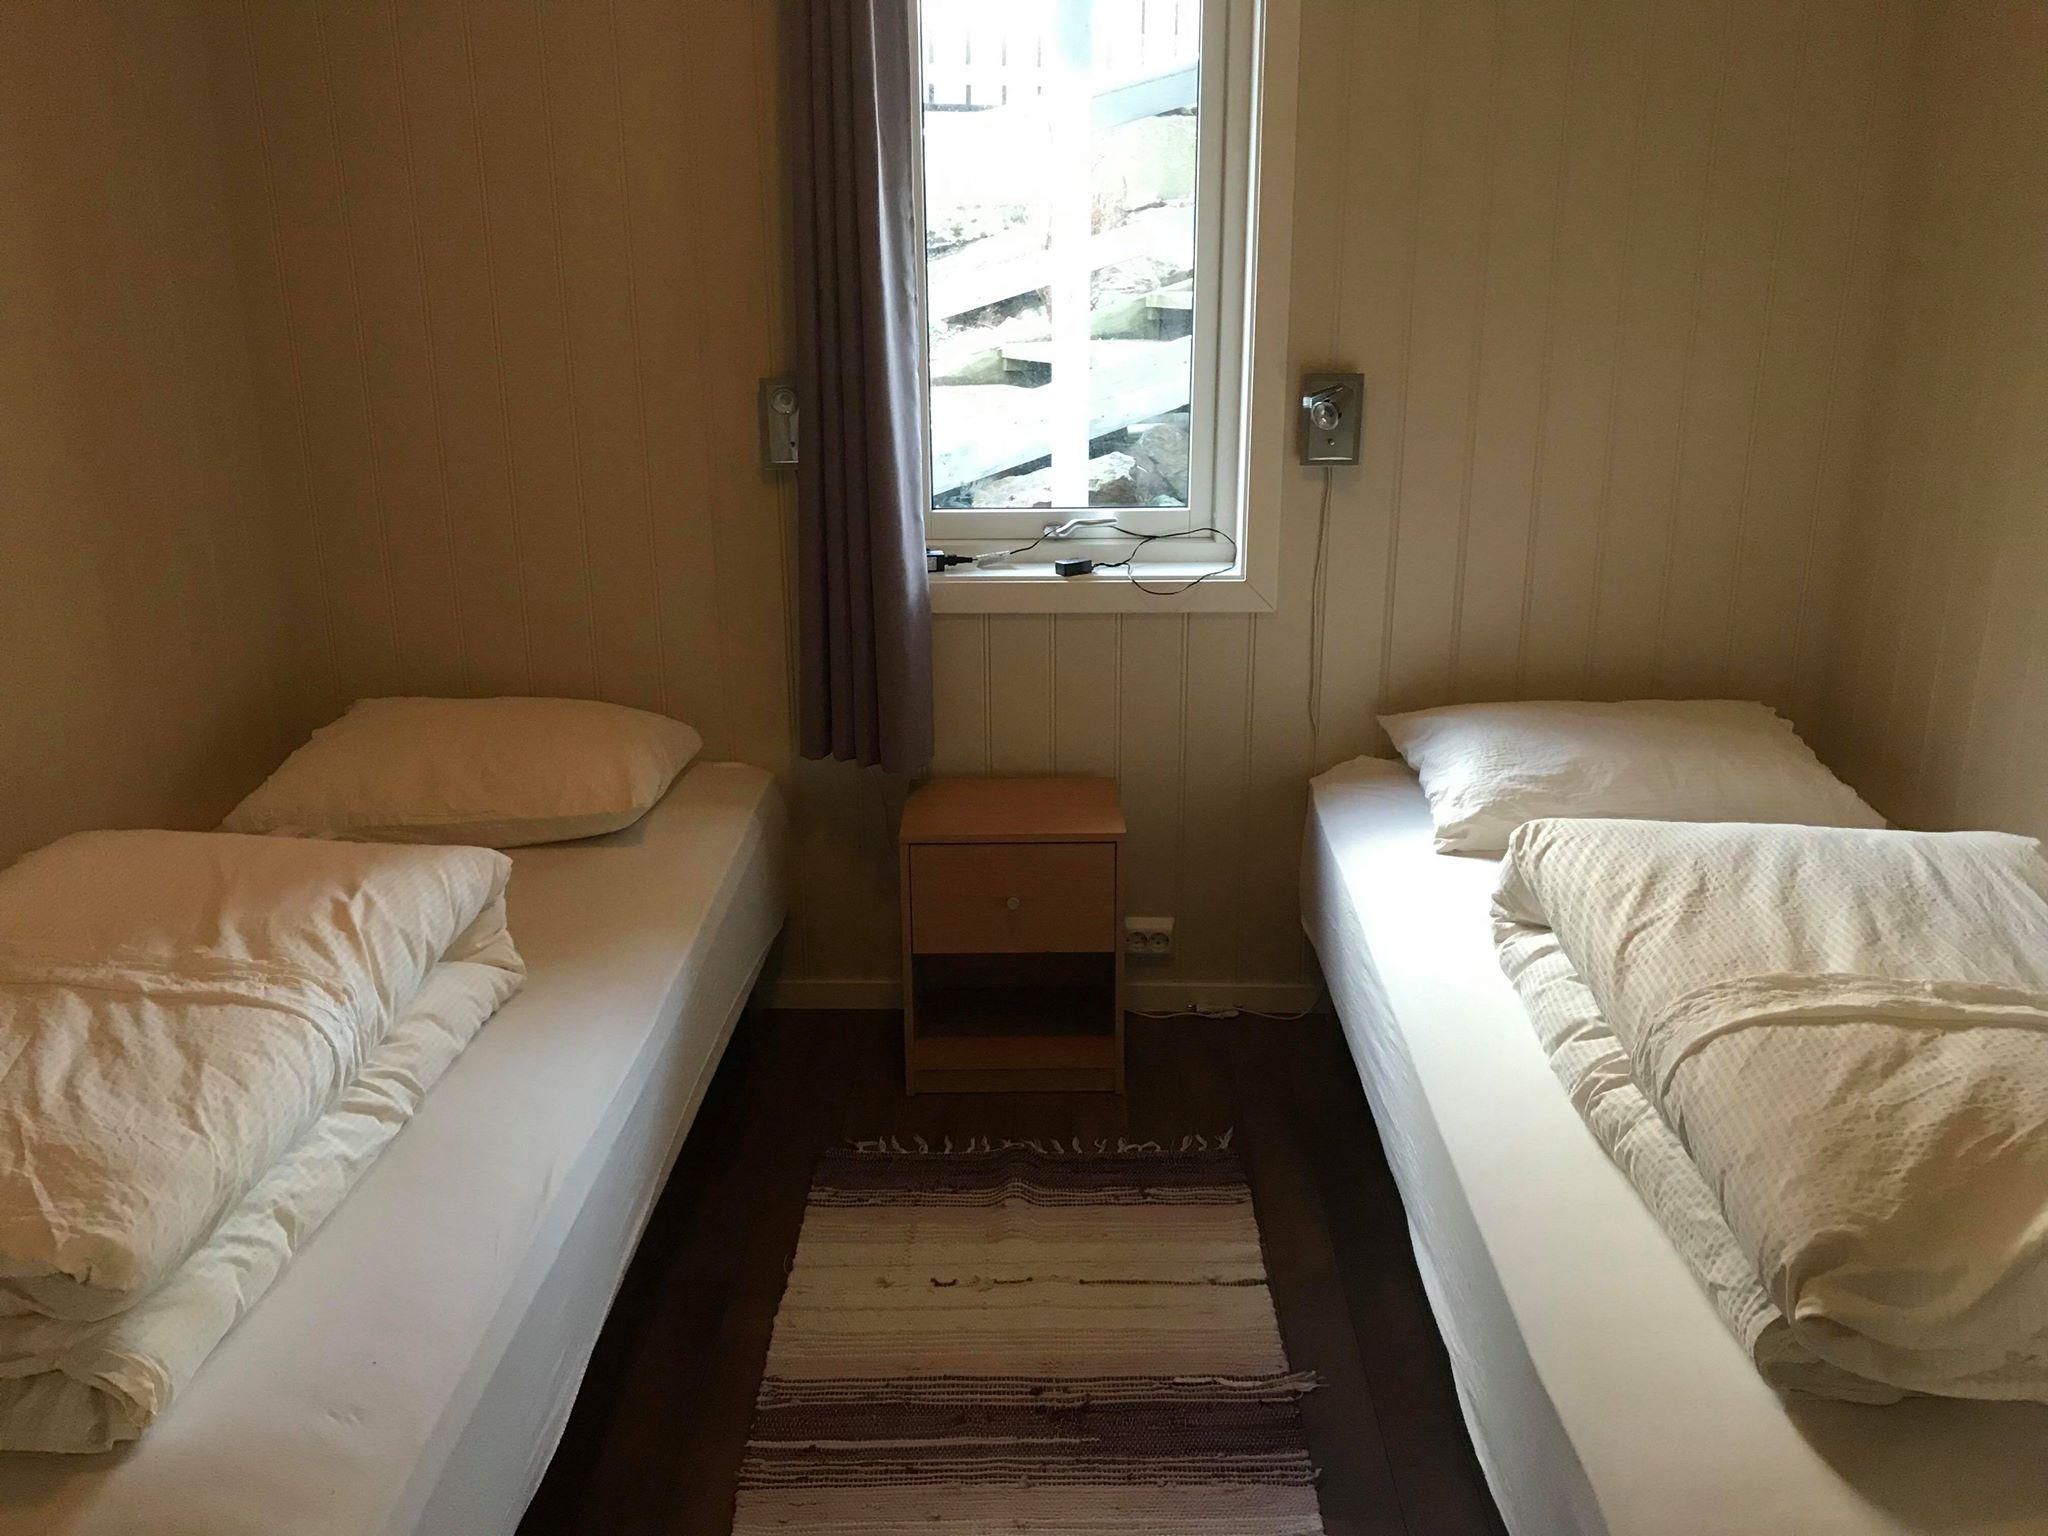 Første etasje sjøhus sov.jpg